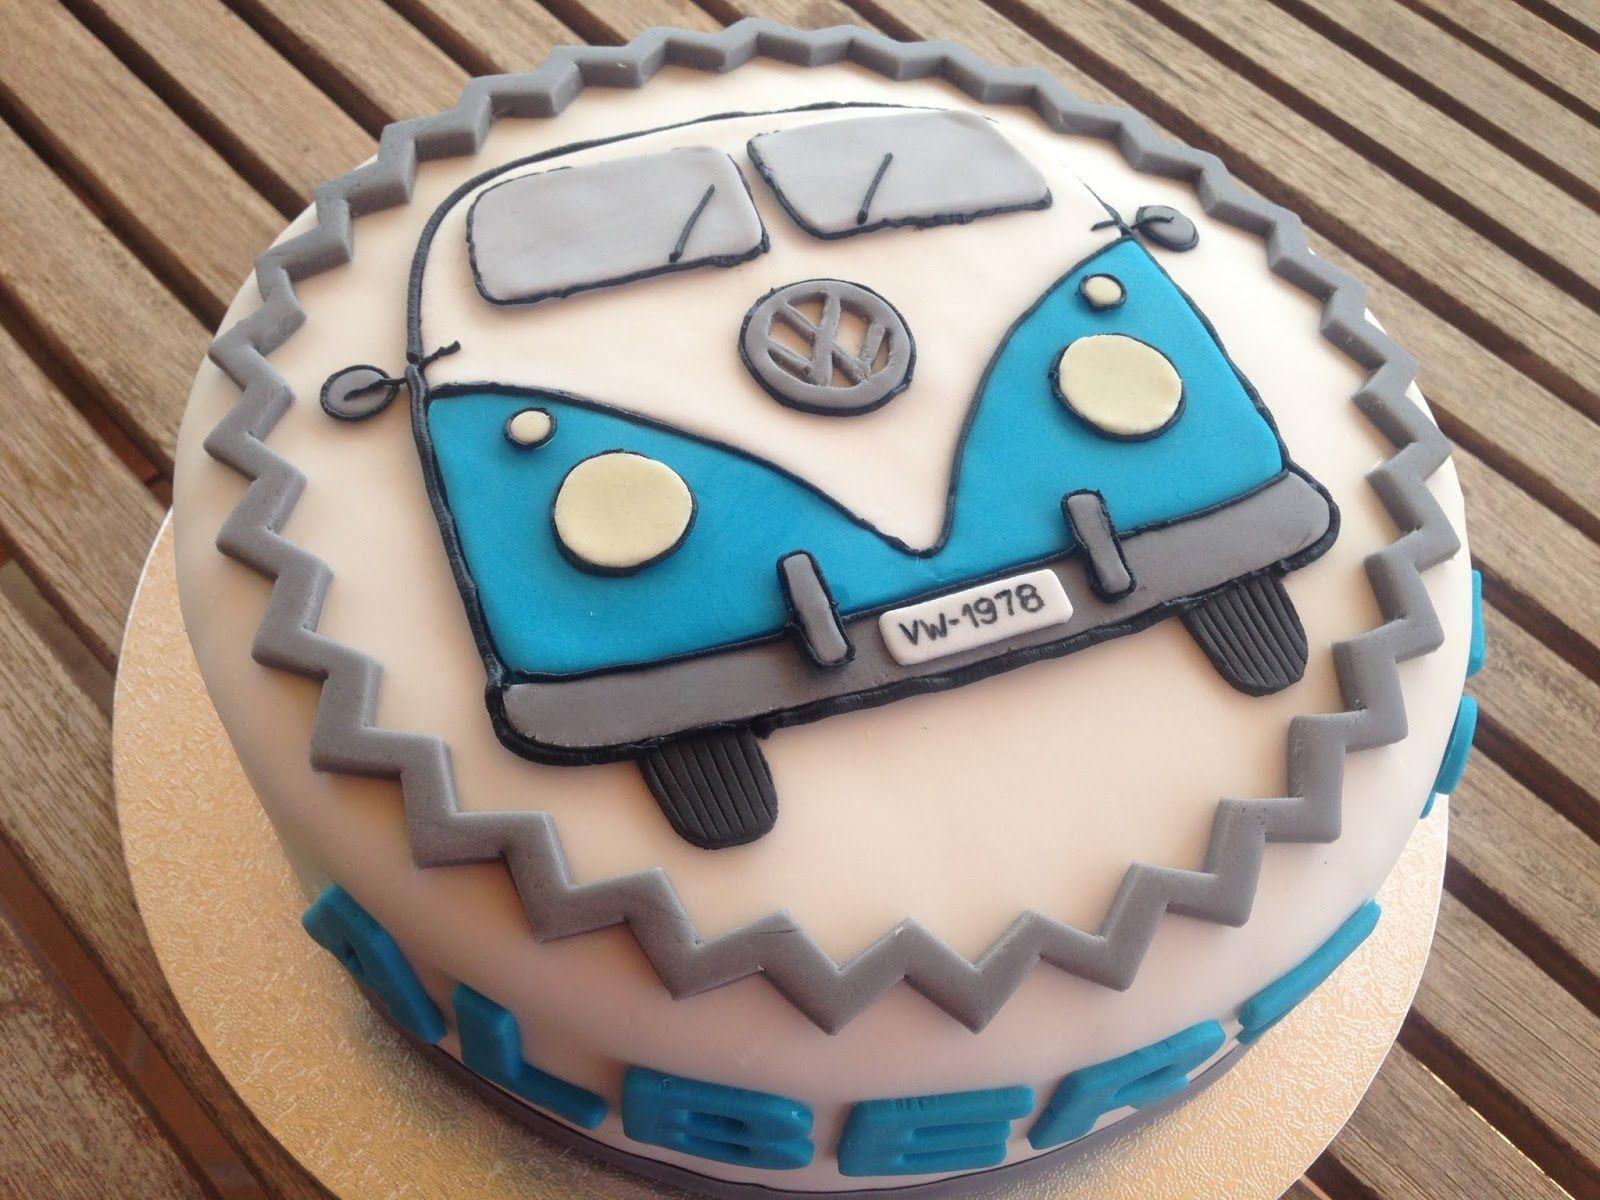 pastis furgo vw vw van cake cakes    cake cupcake cakes camper cakes